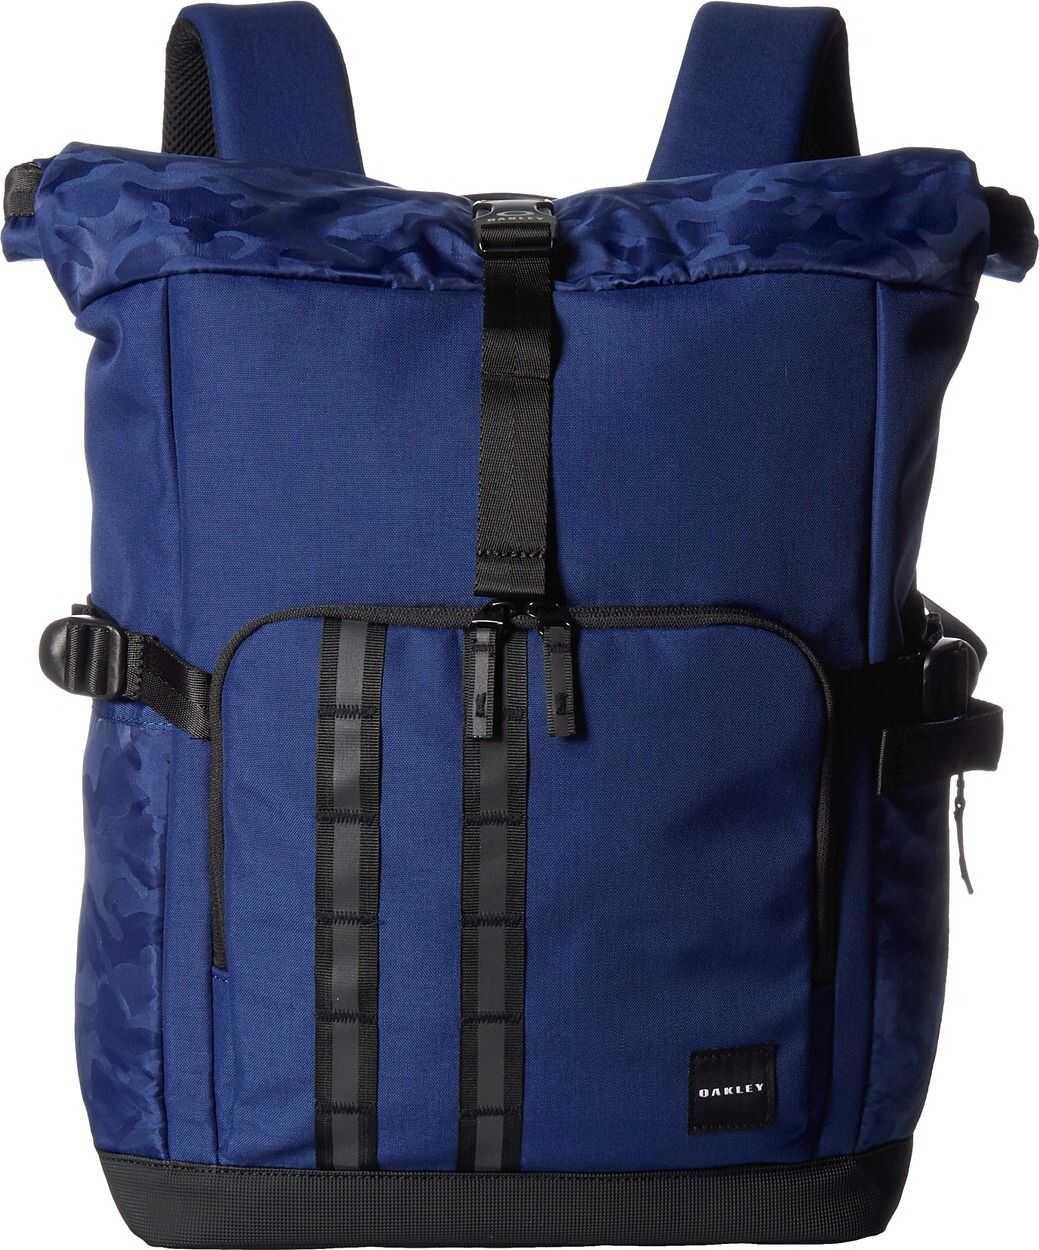 Oakley Utility Rolled Up Backpack Dark Blue